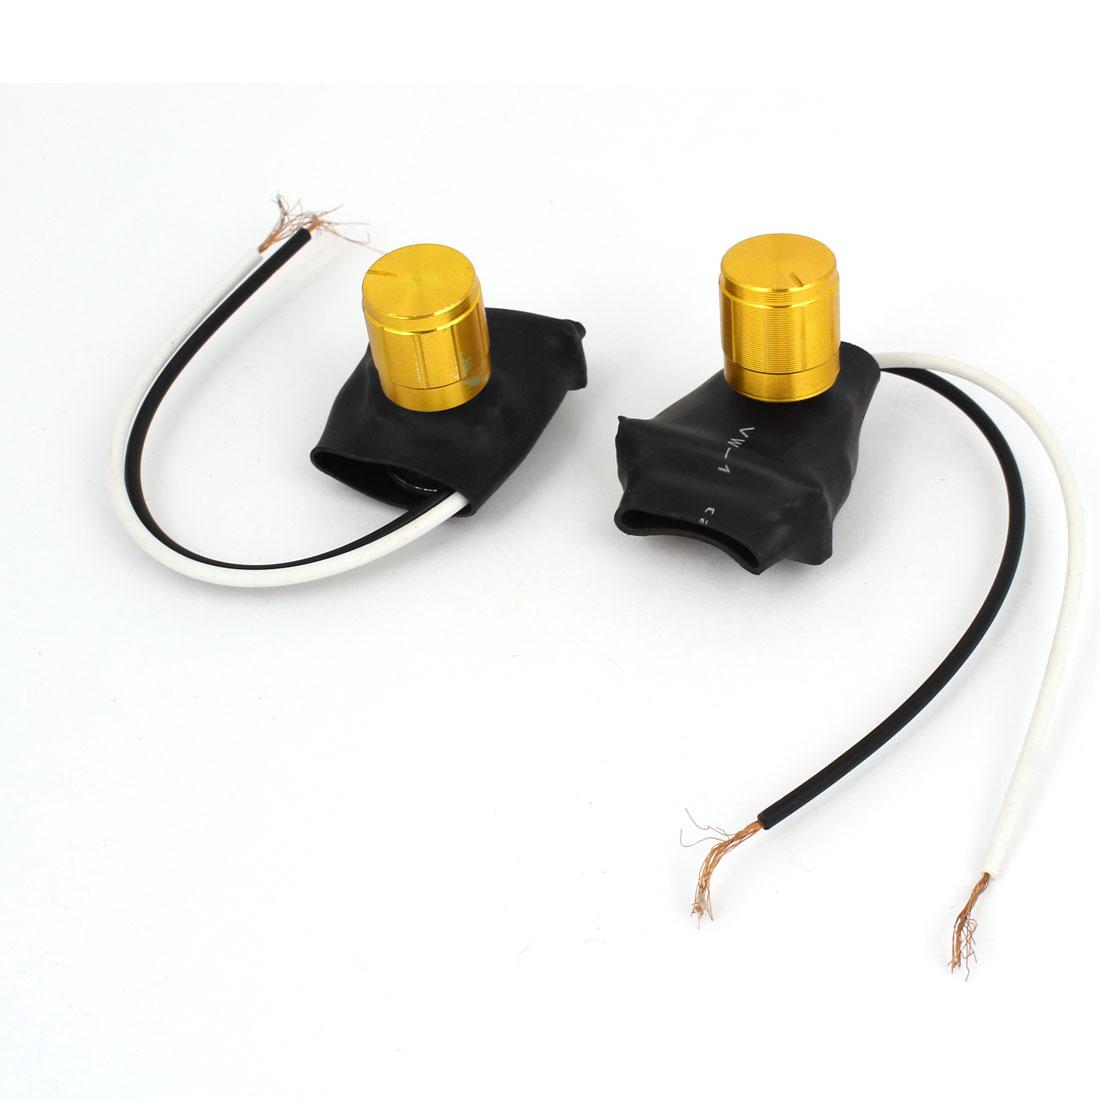 2pcs AC220V 1A Bedroom Desk Table Lamp Light Bulb Dimmer Control Switch